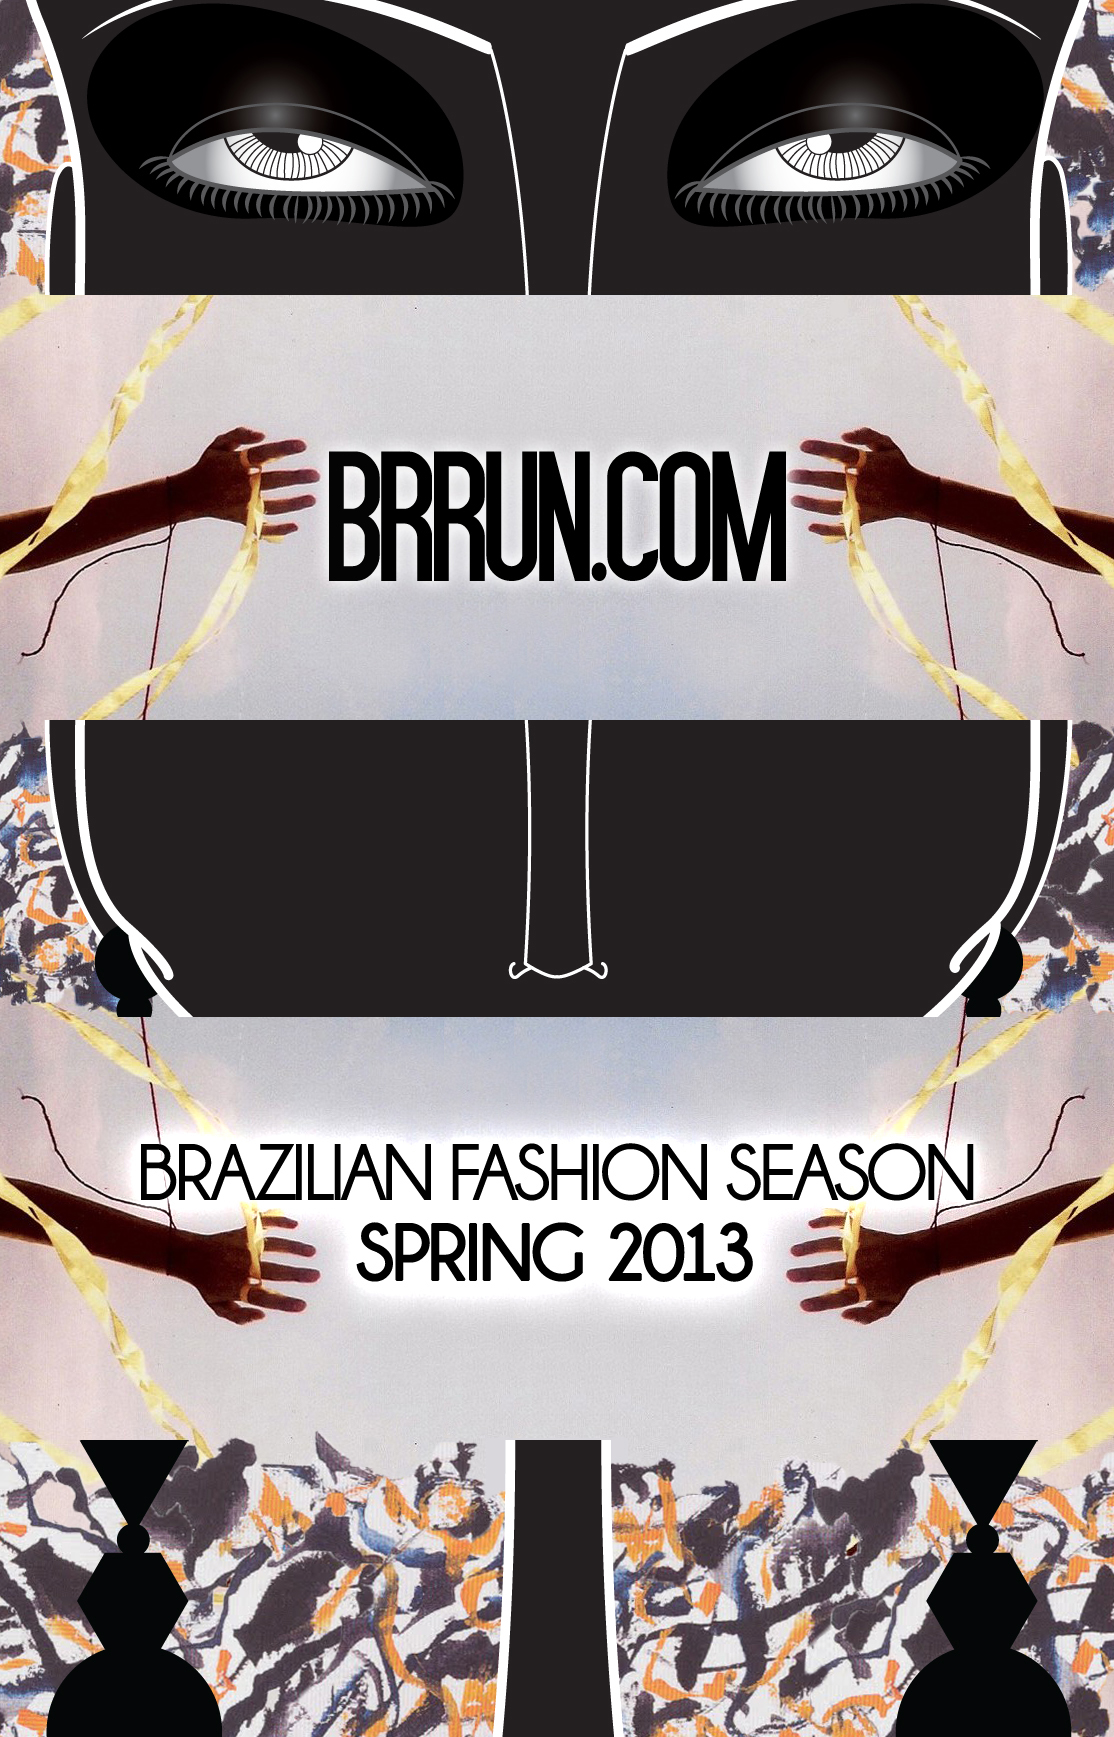 Brazilian Fashion Season, Spring 2013 by Bruno Capasso, Leandro Dário, Beto Urrick e Brunno Almeida Maia @ Tiago Gomes